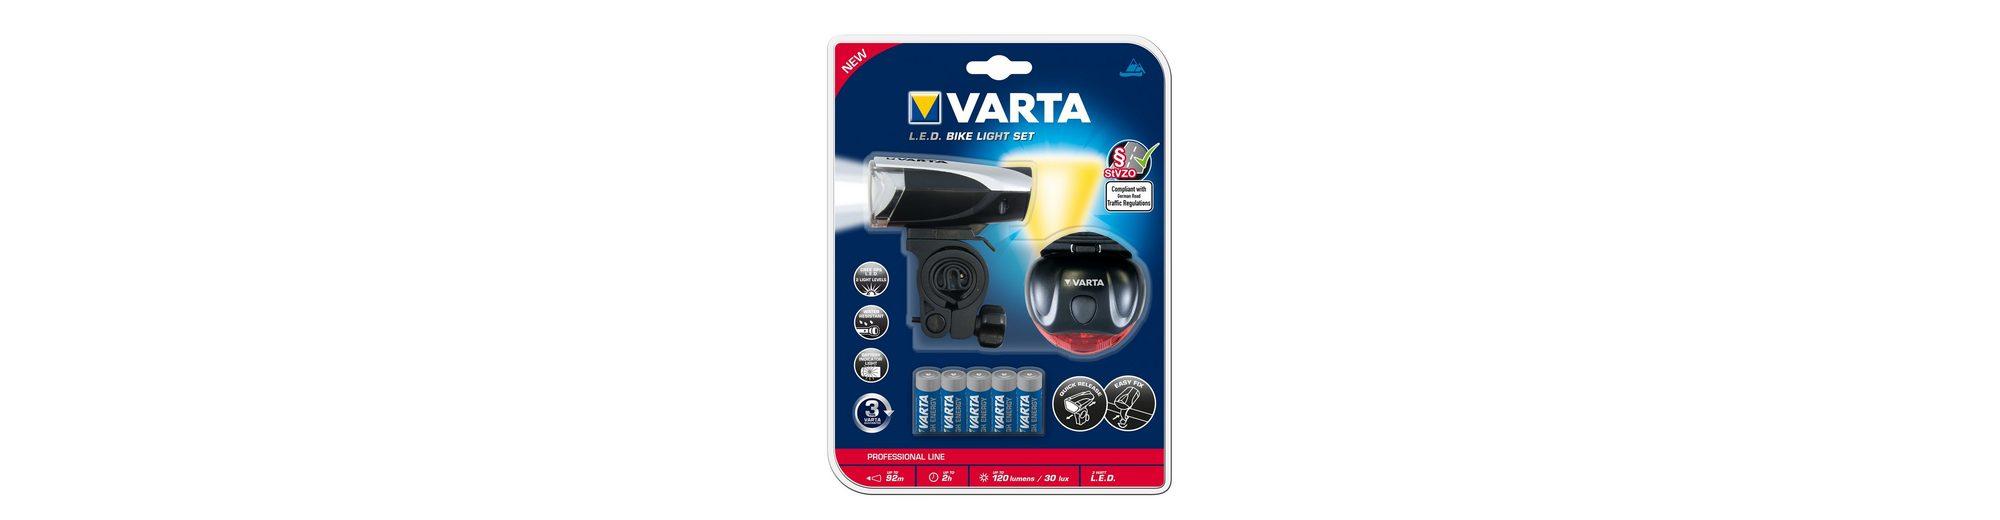 Fahrrad-Beleuchtungs-Set, »LED Bike Light«, Varta